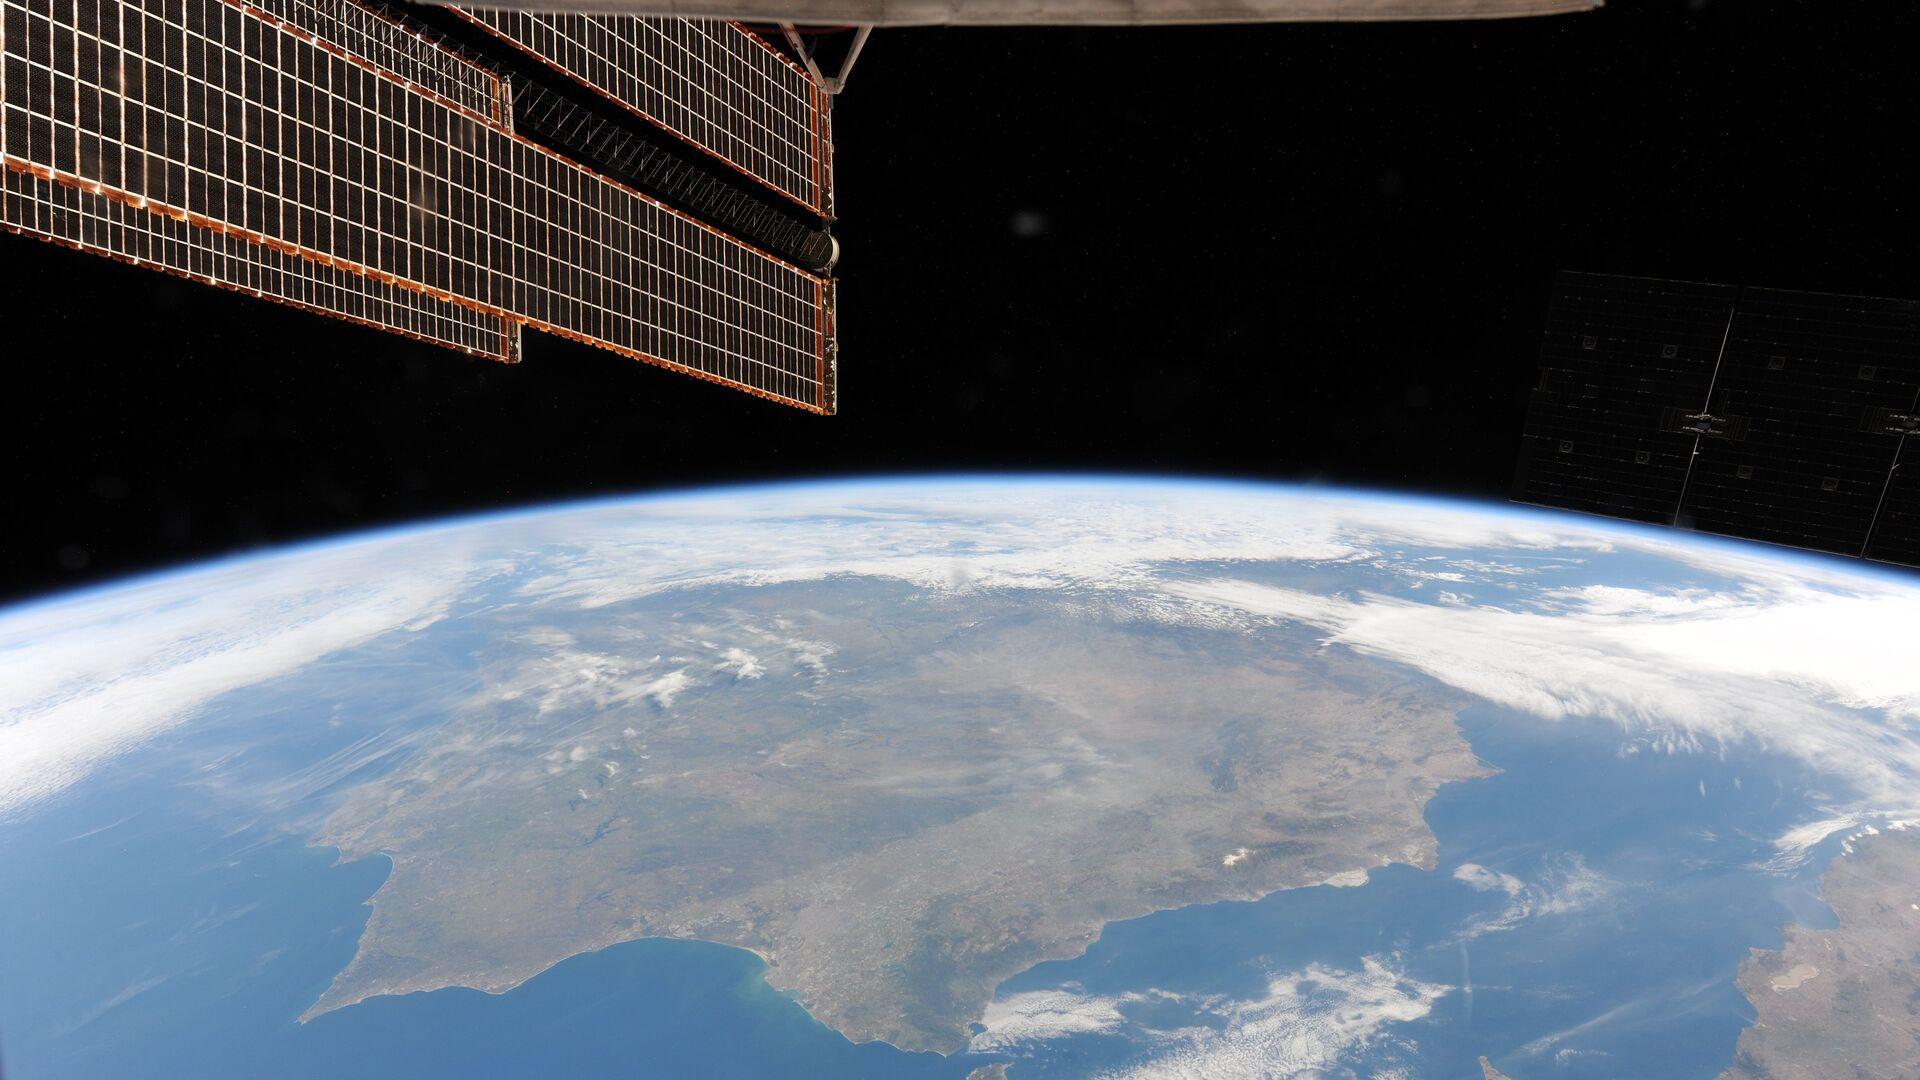 La terra vista dallo spazio - Sputnik Italia, 1920, 13.06.2021